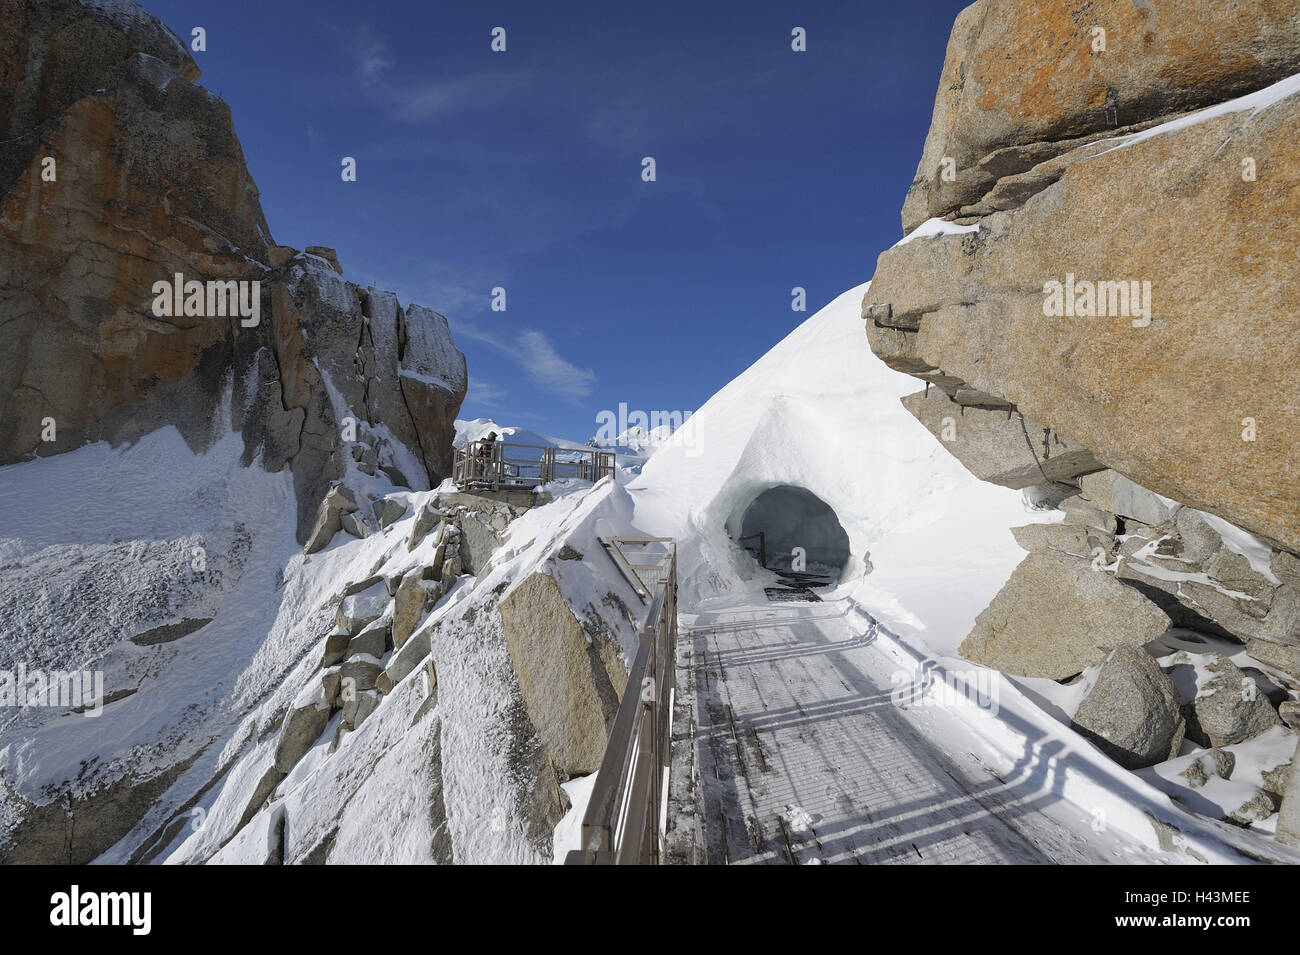 France, Savoy Alps, Chamonix, Mont Blanc, Aiguille du Midi, ice tunnel, path, Stock Photo